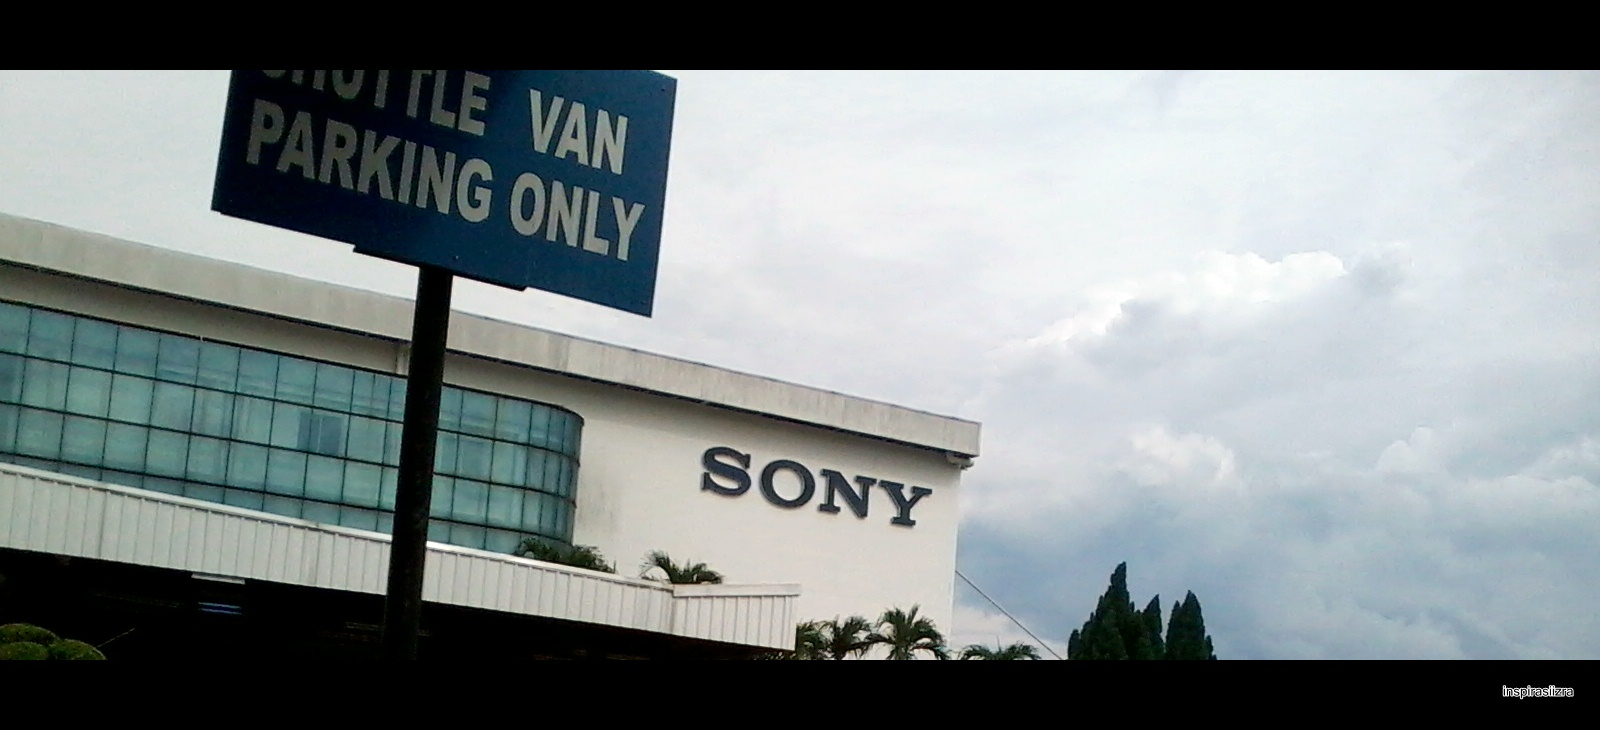 Jom Mohon Latihan Industri Di Sony Bangi